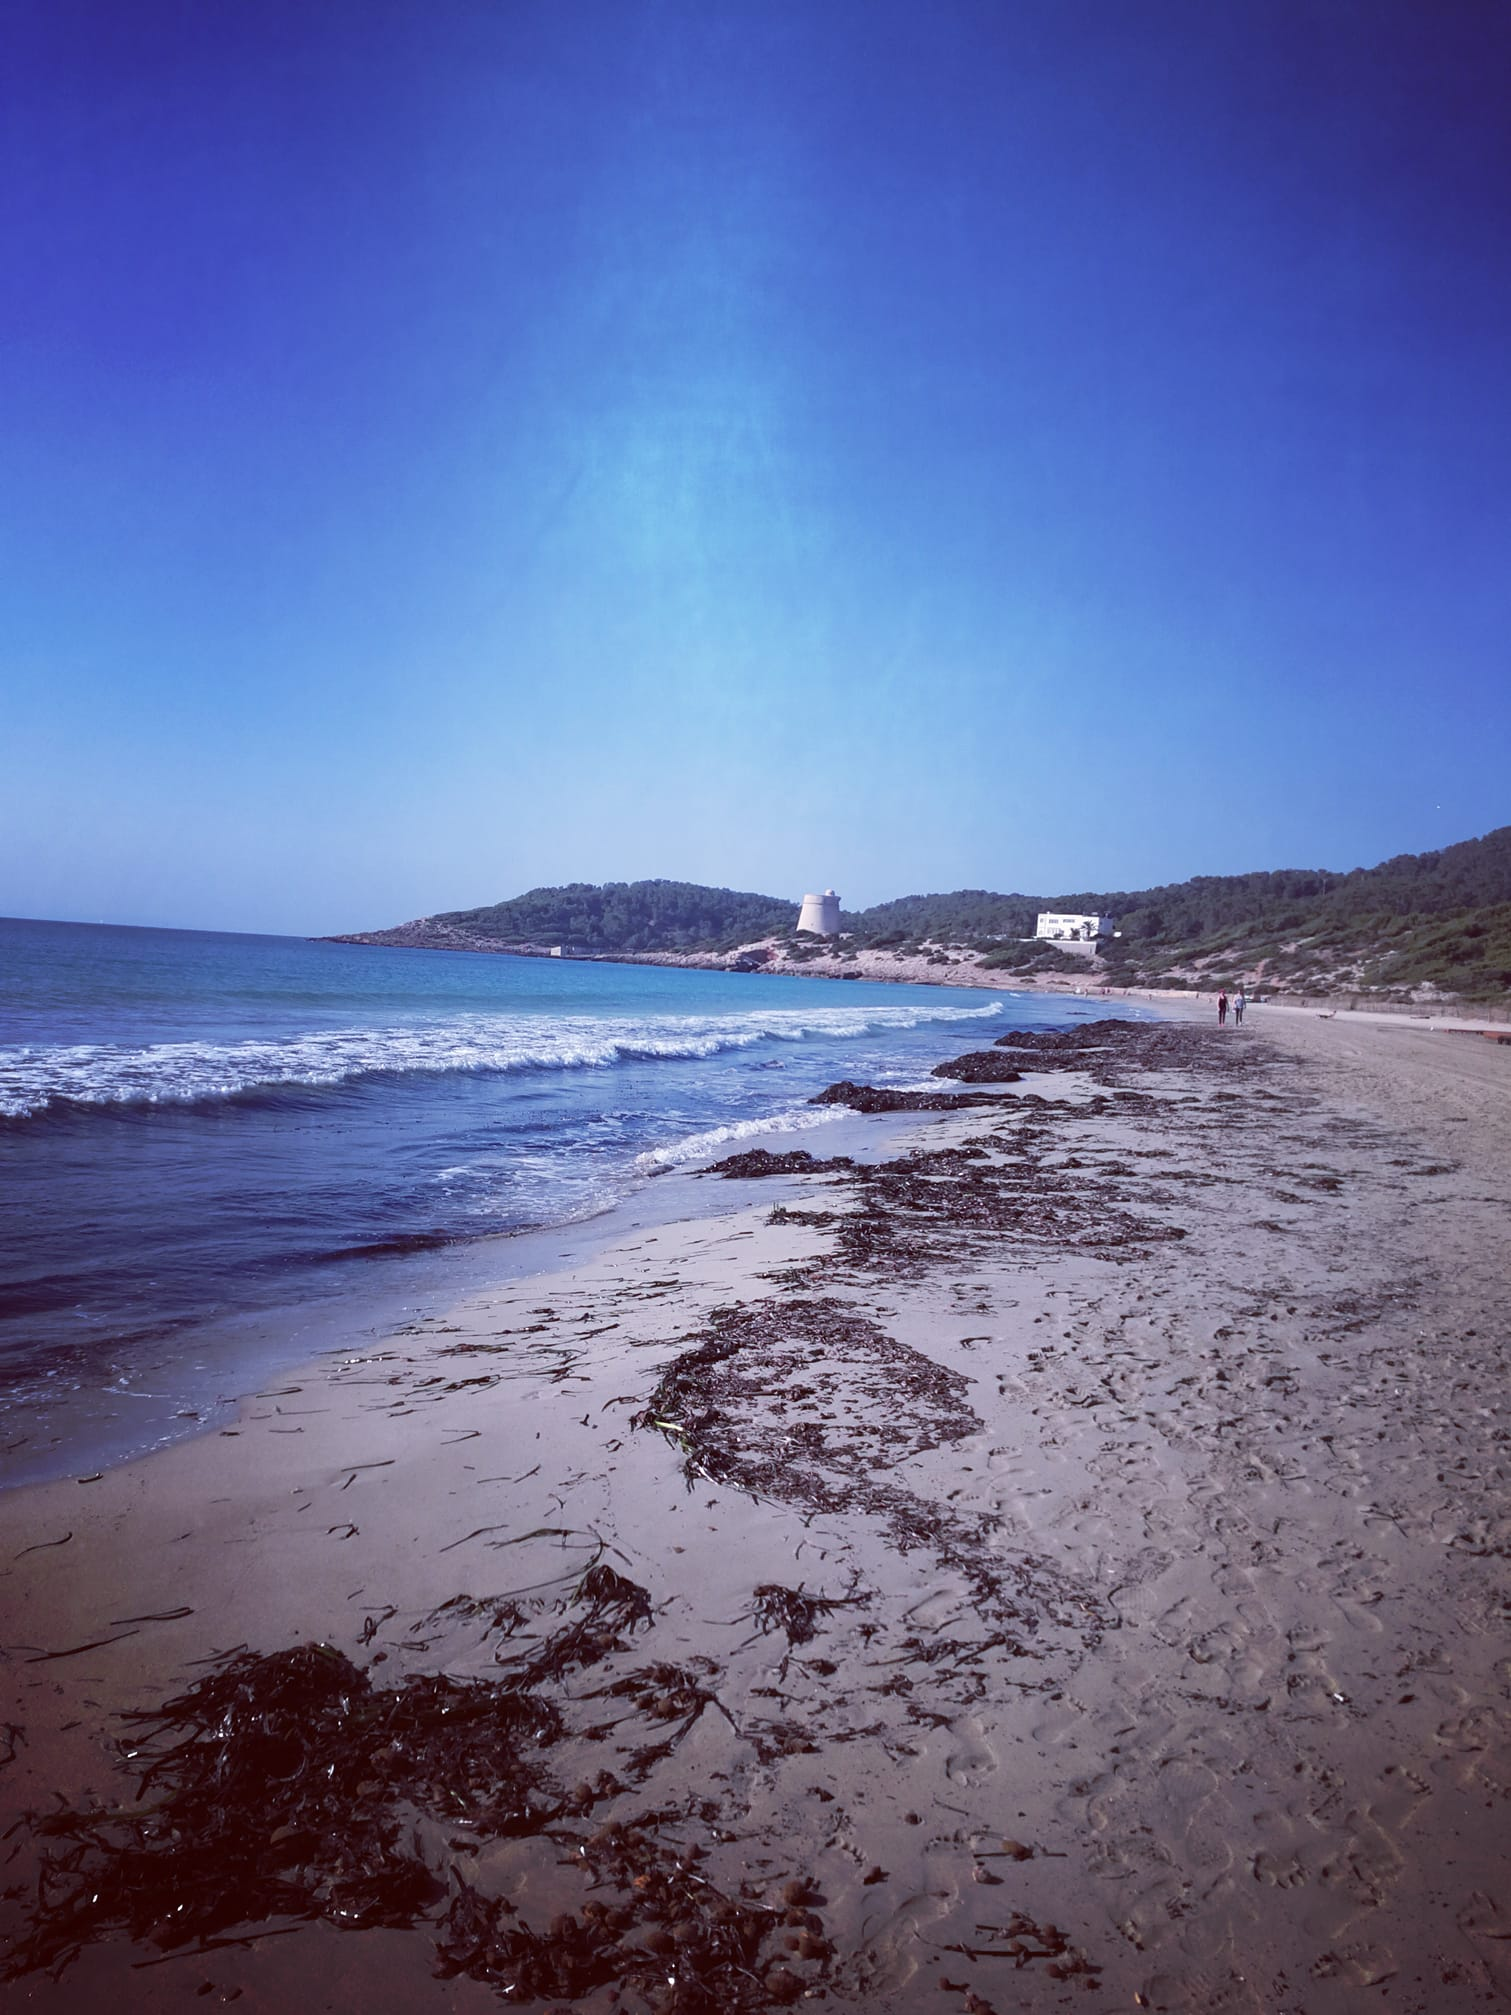 Karin Maier in Urlaub am Meer